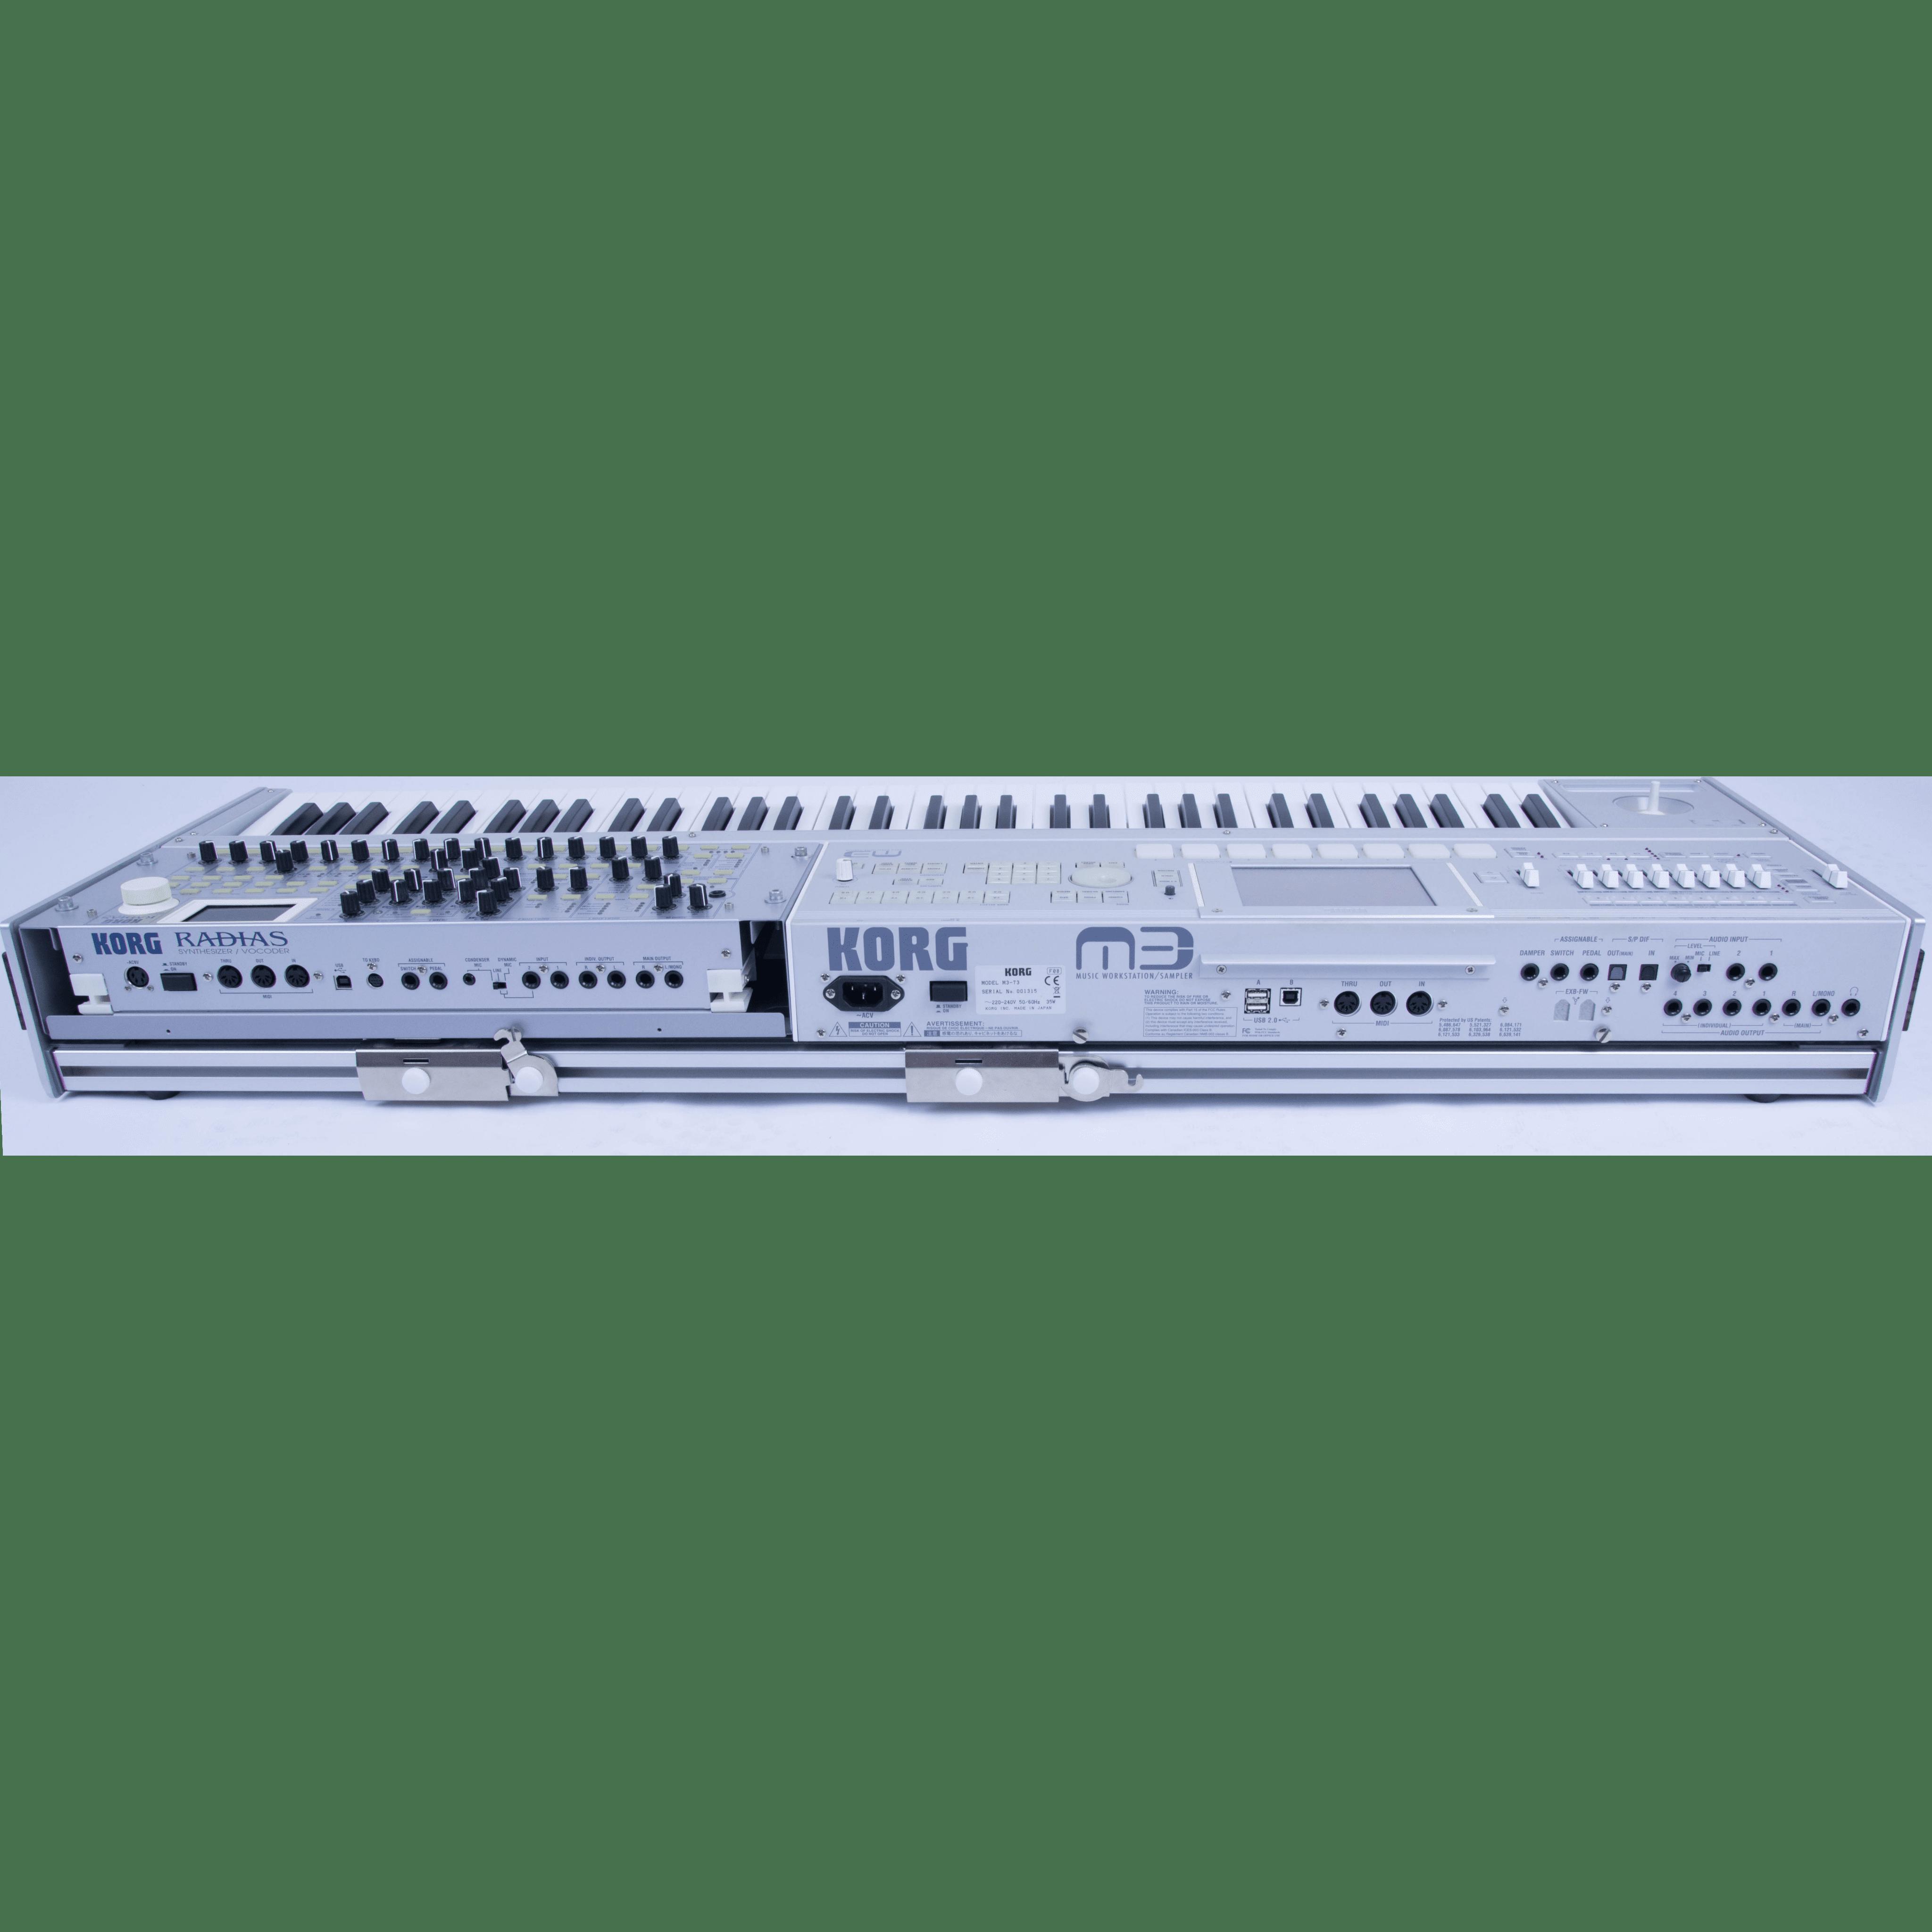 Korg M3 Radias combo synth - Ocsidance Pro Audio